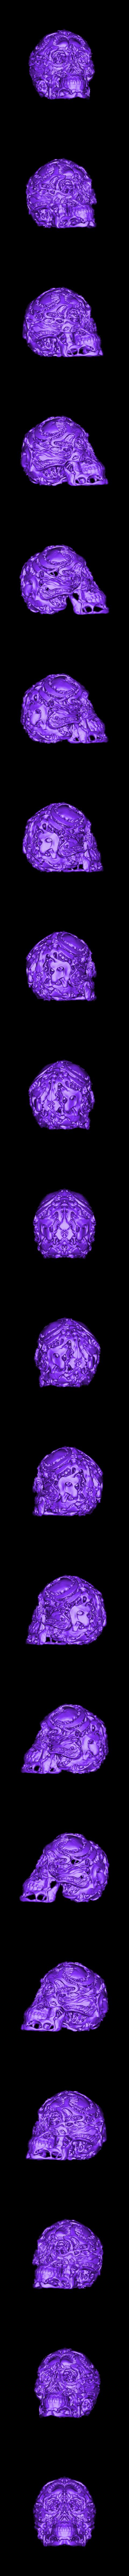 humanhunter-skull.obj Download free OBJ file Hunters - Hunter's Skull • 3D printable template, SYFY